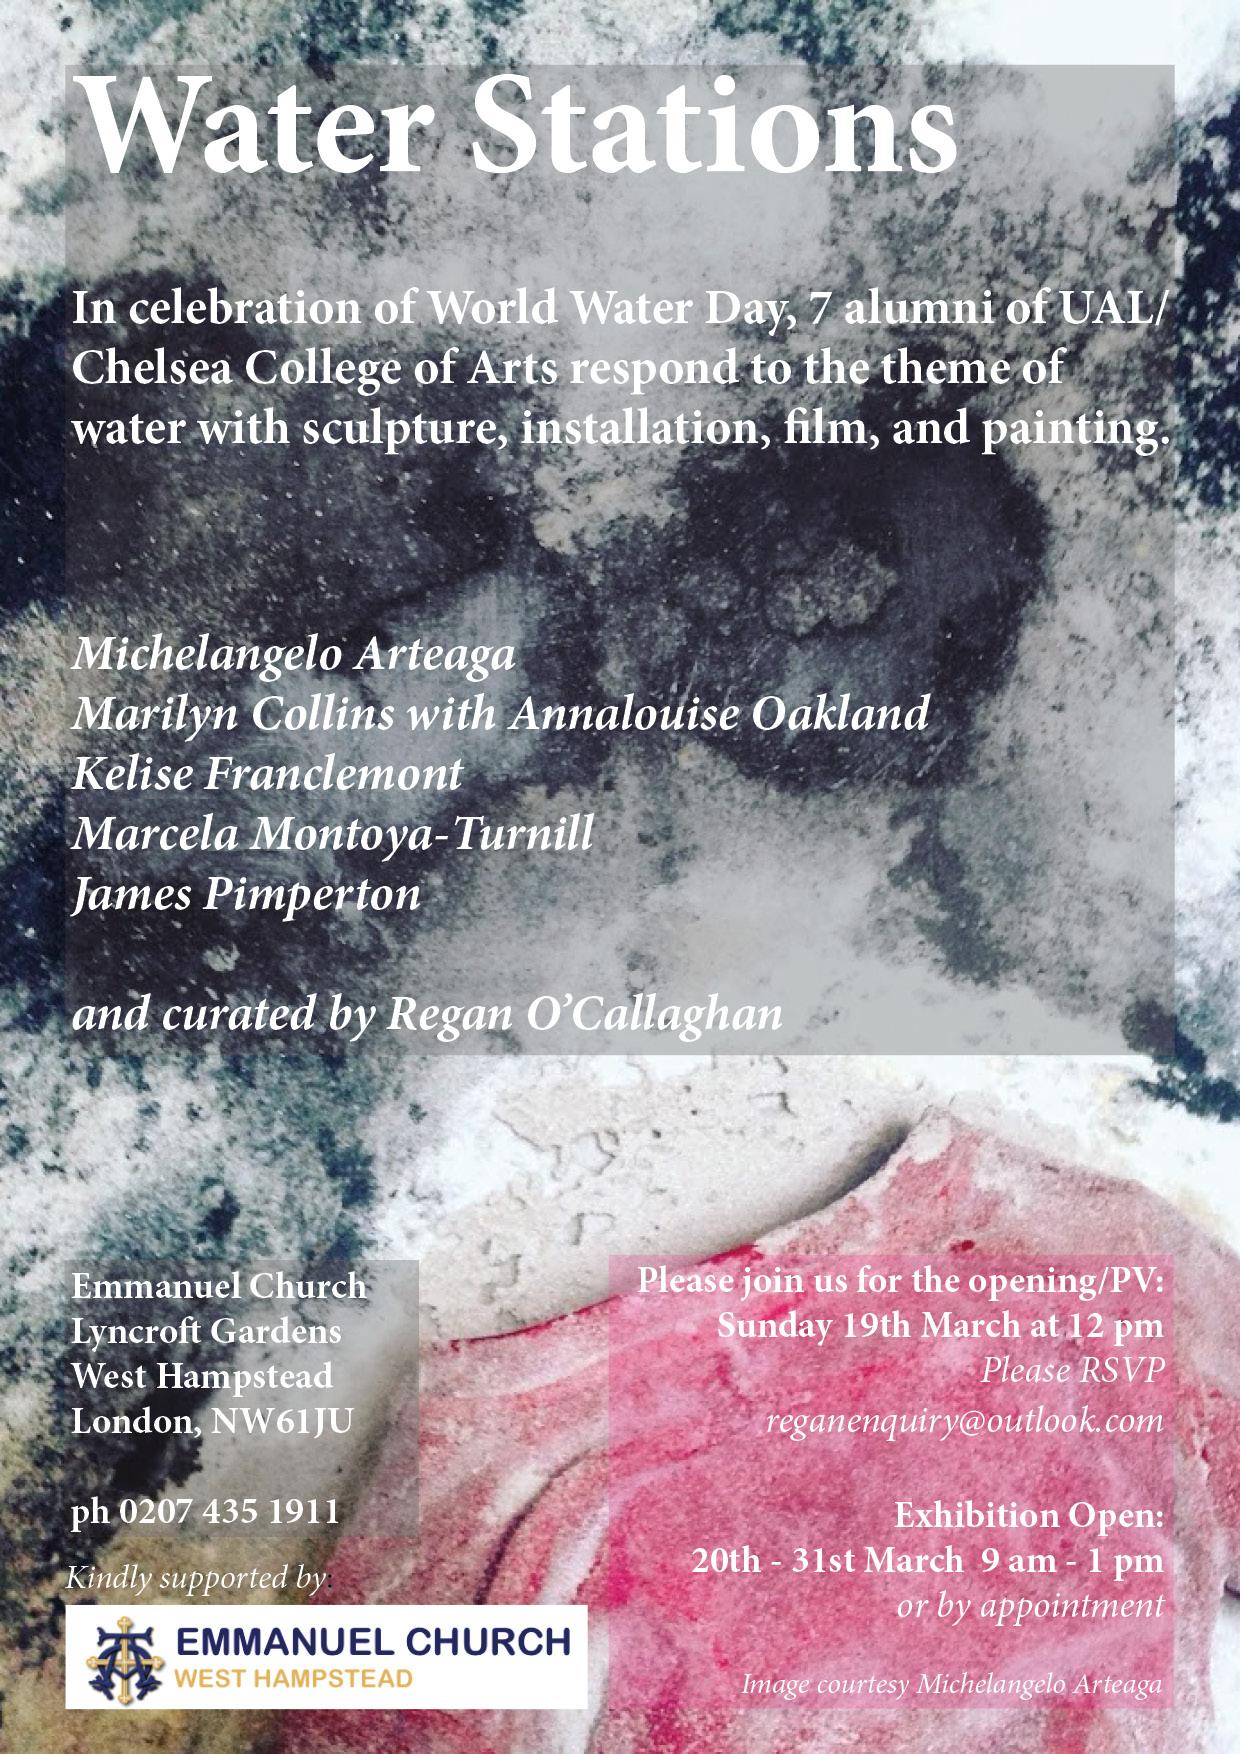 WaterStations-Emmanual_eflyer_02.jpg